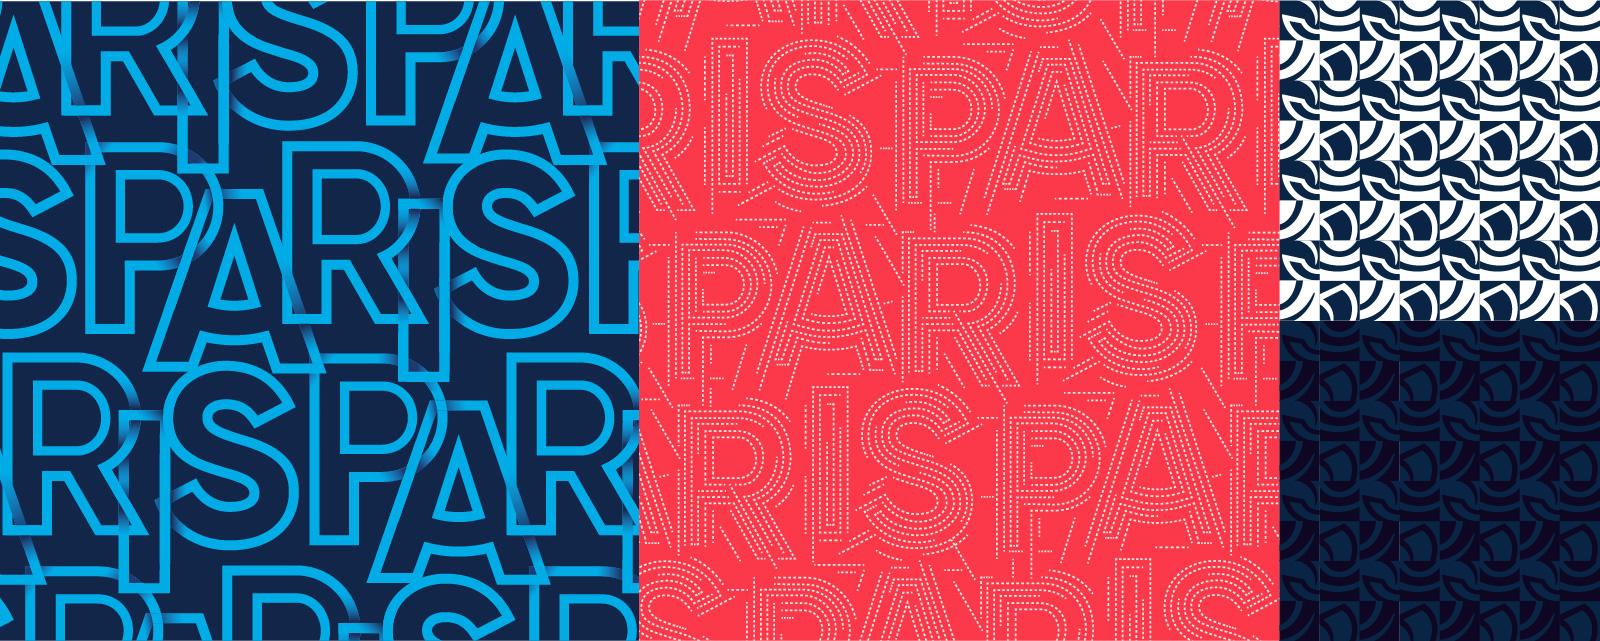 city_of_paris_patterns Il nuovo logo di Parigi